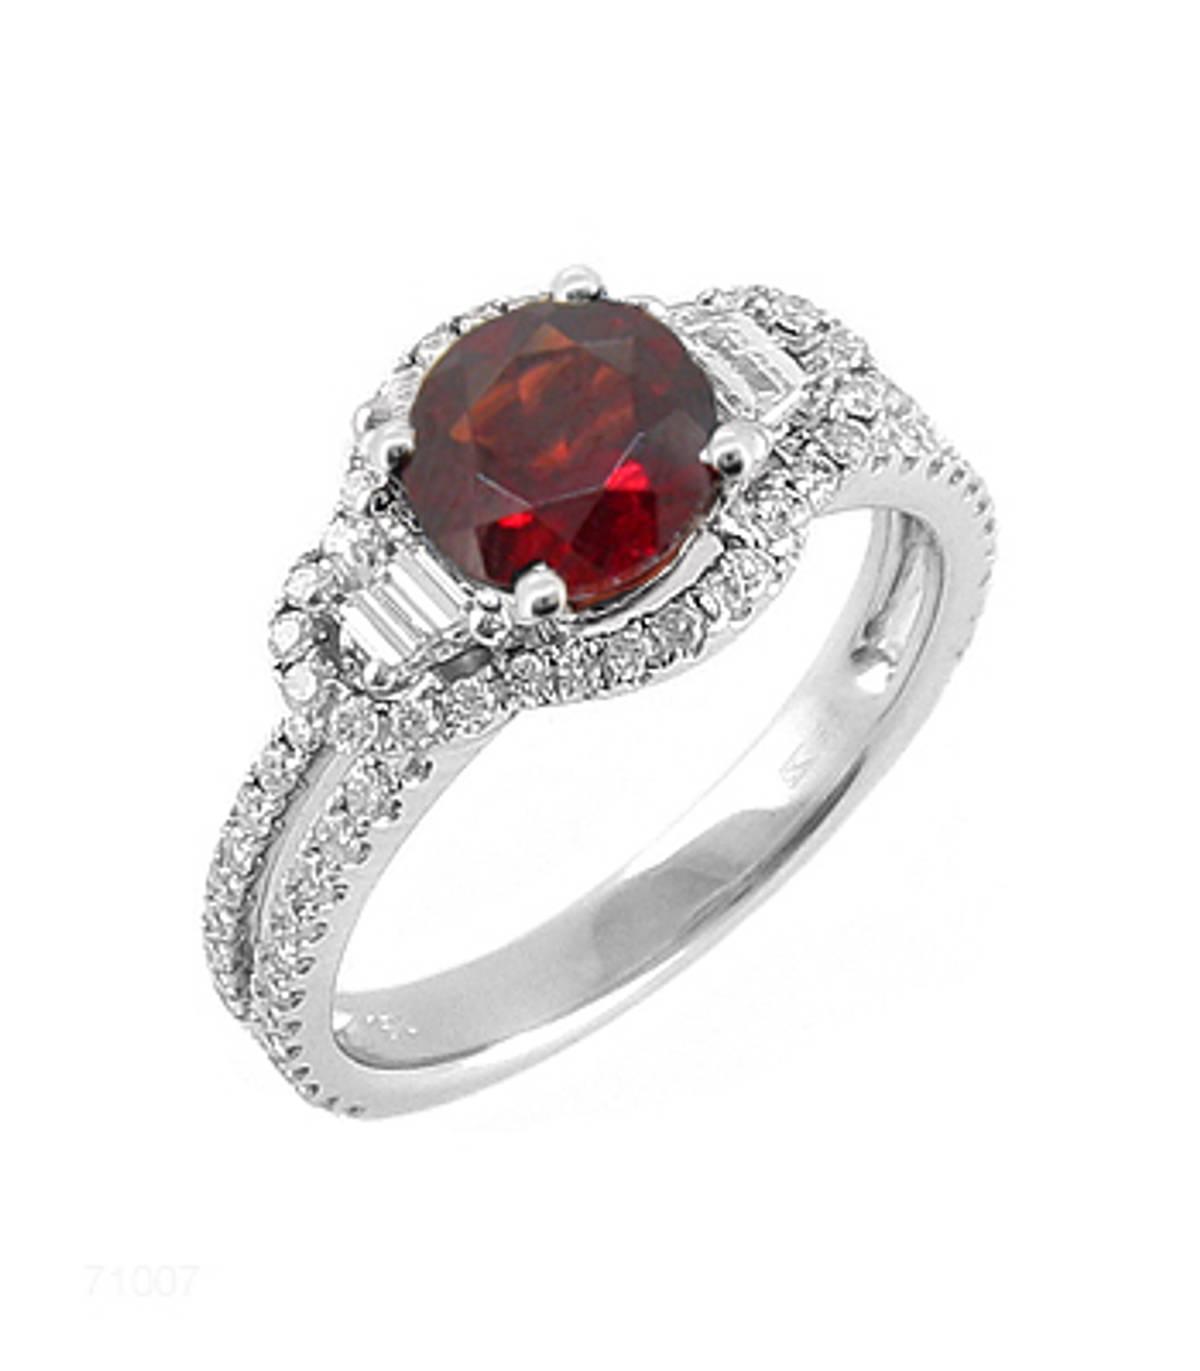 Garnet and diamond cluster ringPictured item: garnet: total 1.00ct/diamonds: total 0.73ct set in 18k white gold